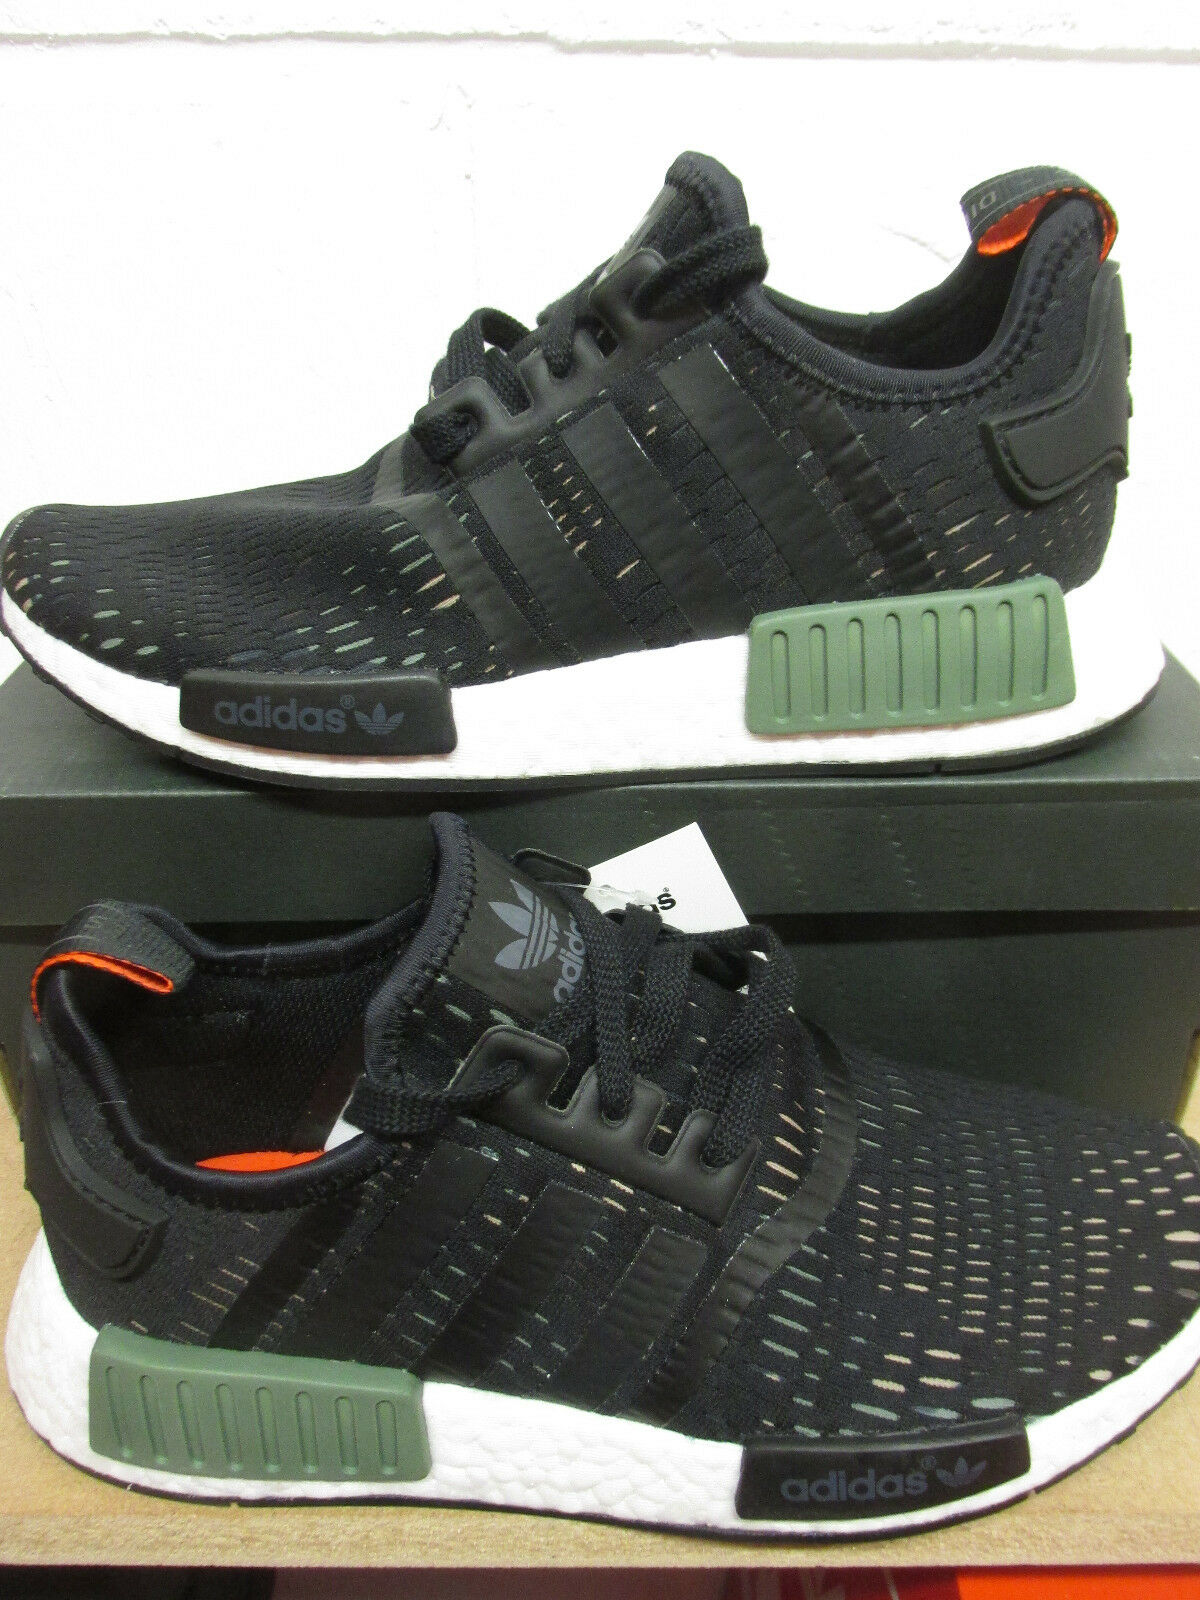 1839375a03 Adidas originali nmd r1 Uomo formatori bb1357 scarpe scarpe ...